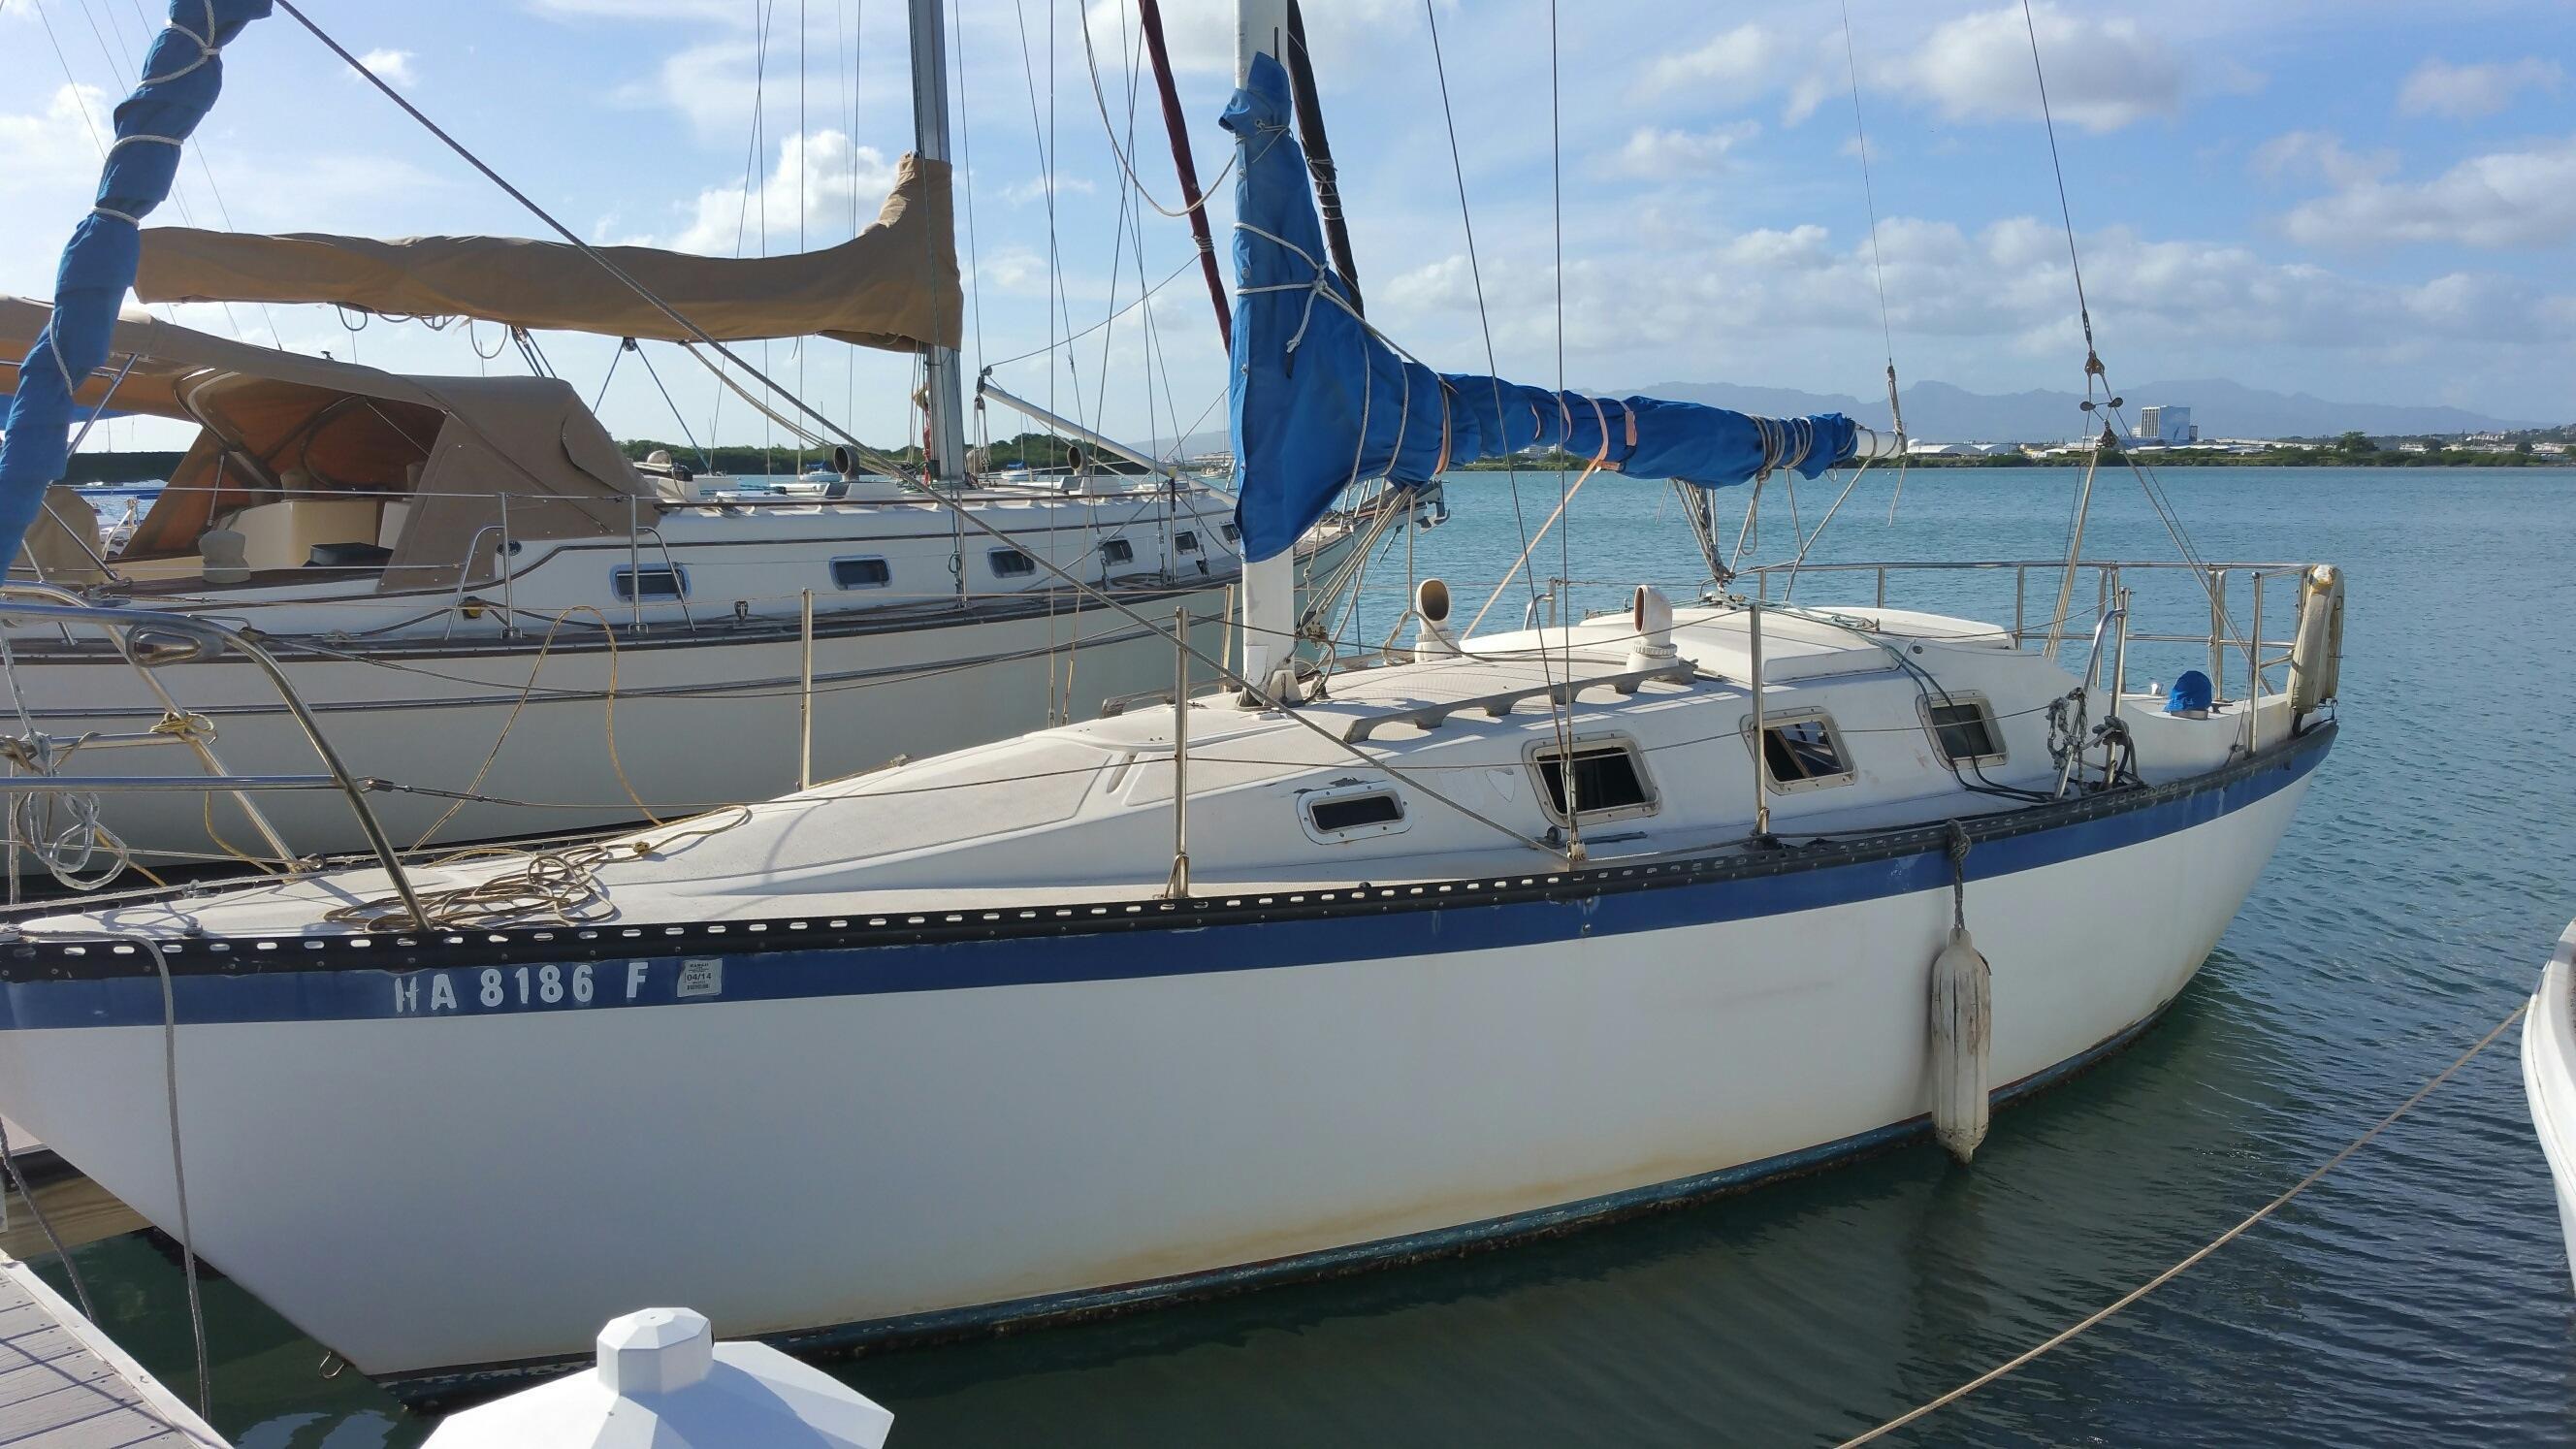 1981 Lancer Sloop Sail Boat For Sale Wwwyachtworldcom